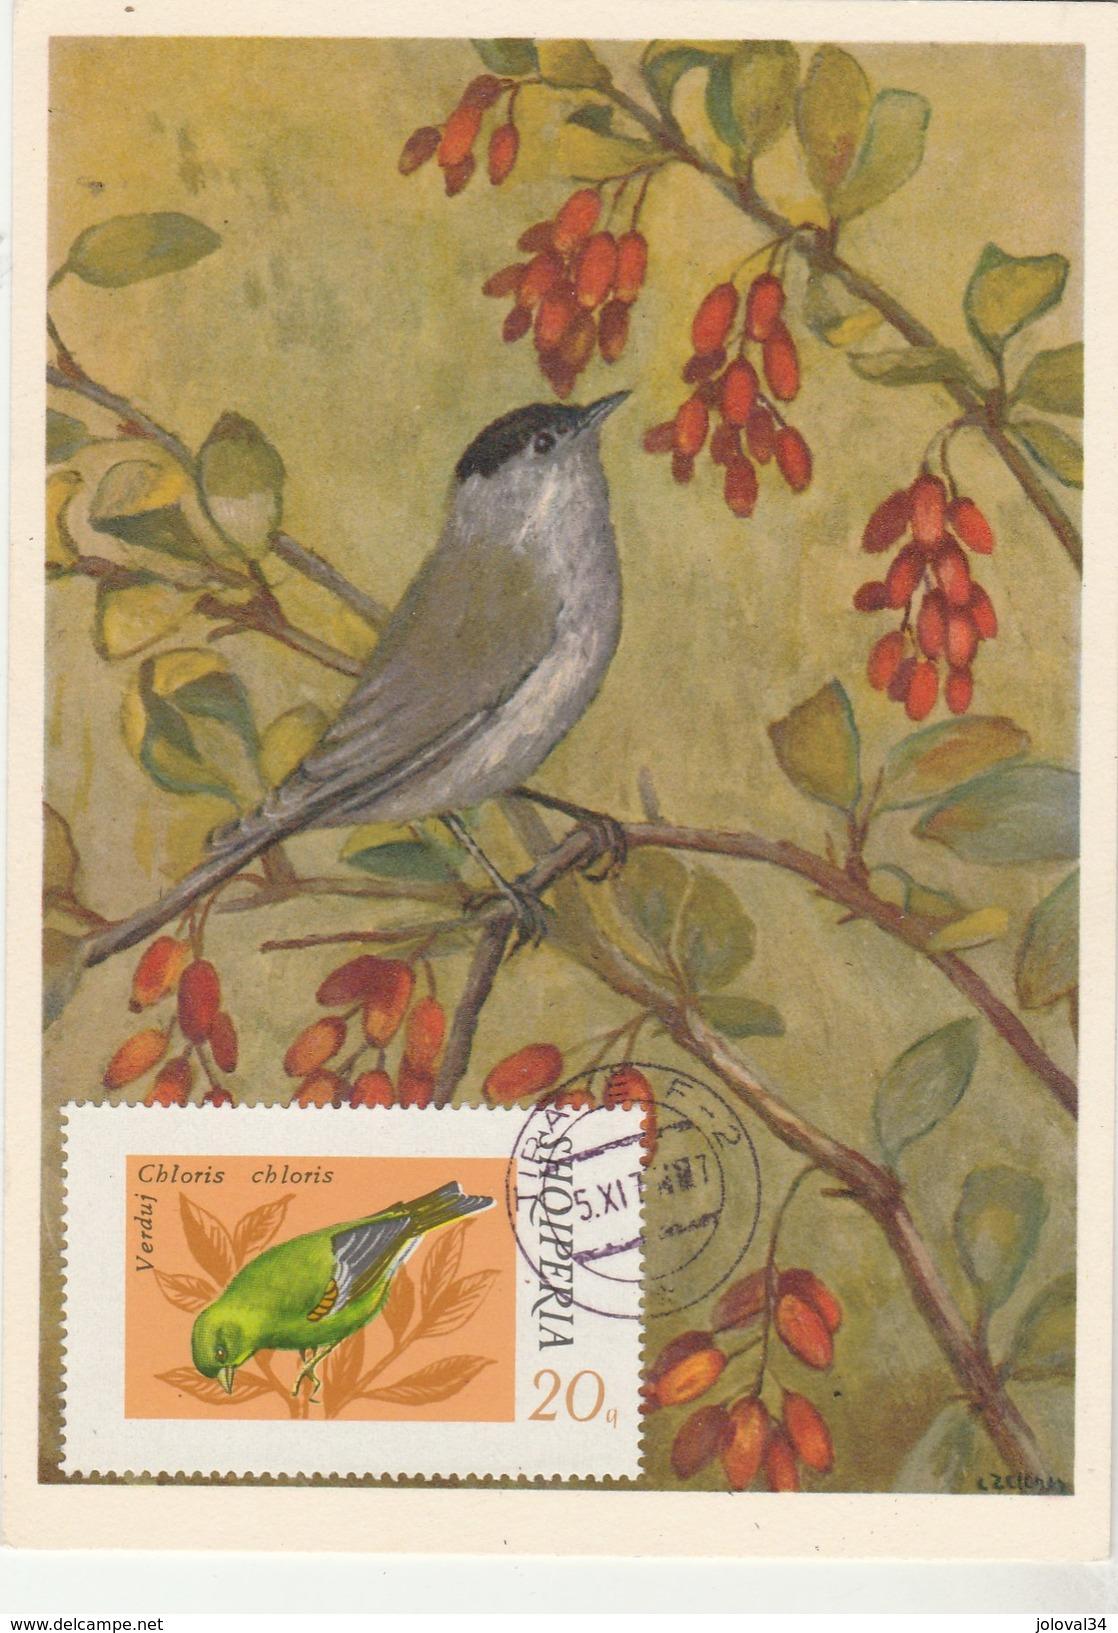 Albanie Carte Maximum 1975  Yvert  1524 - Verdier - Thème Animaux Oiseaux Chanteurs - Albanie